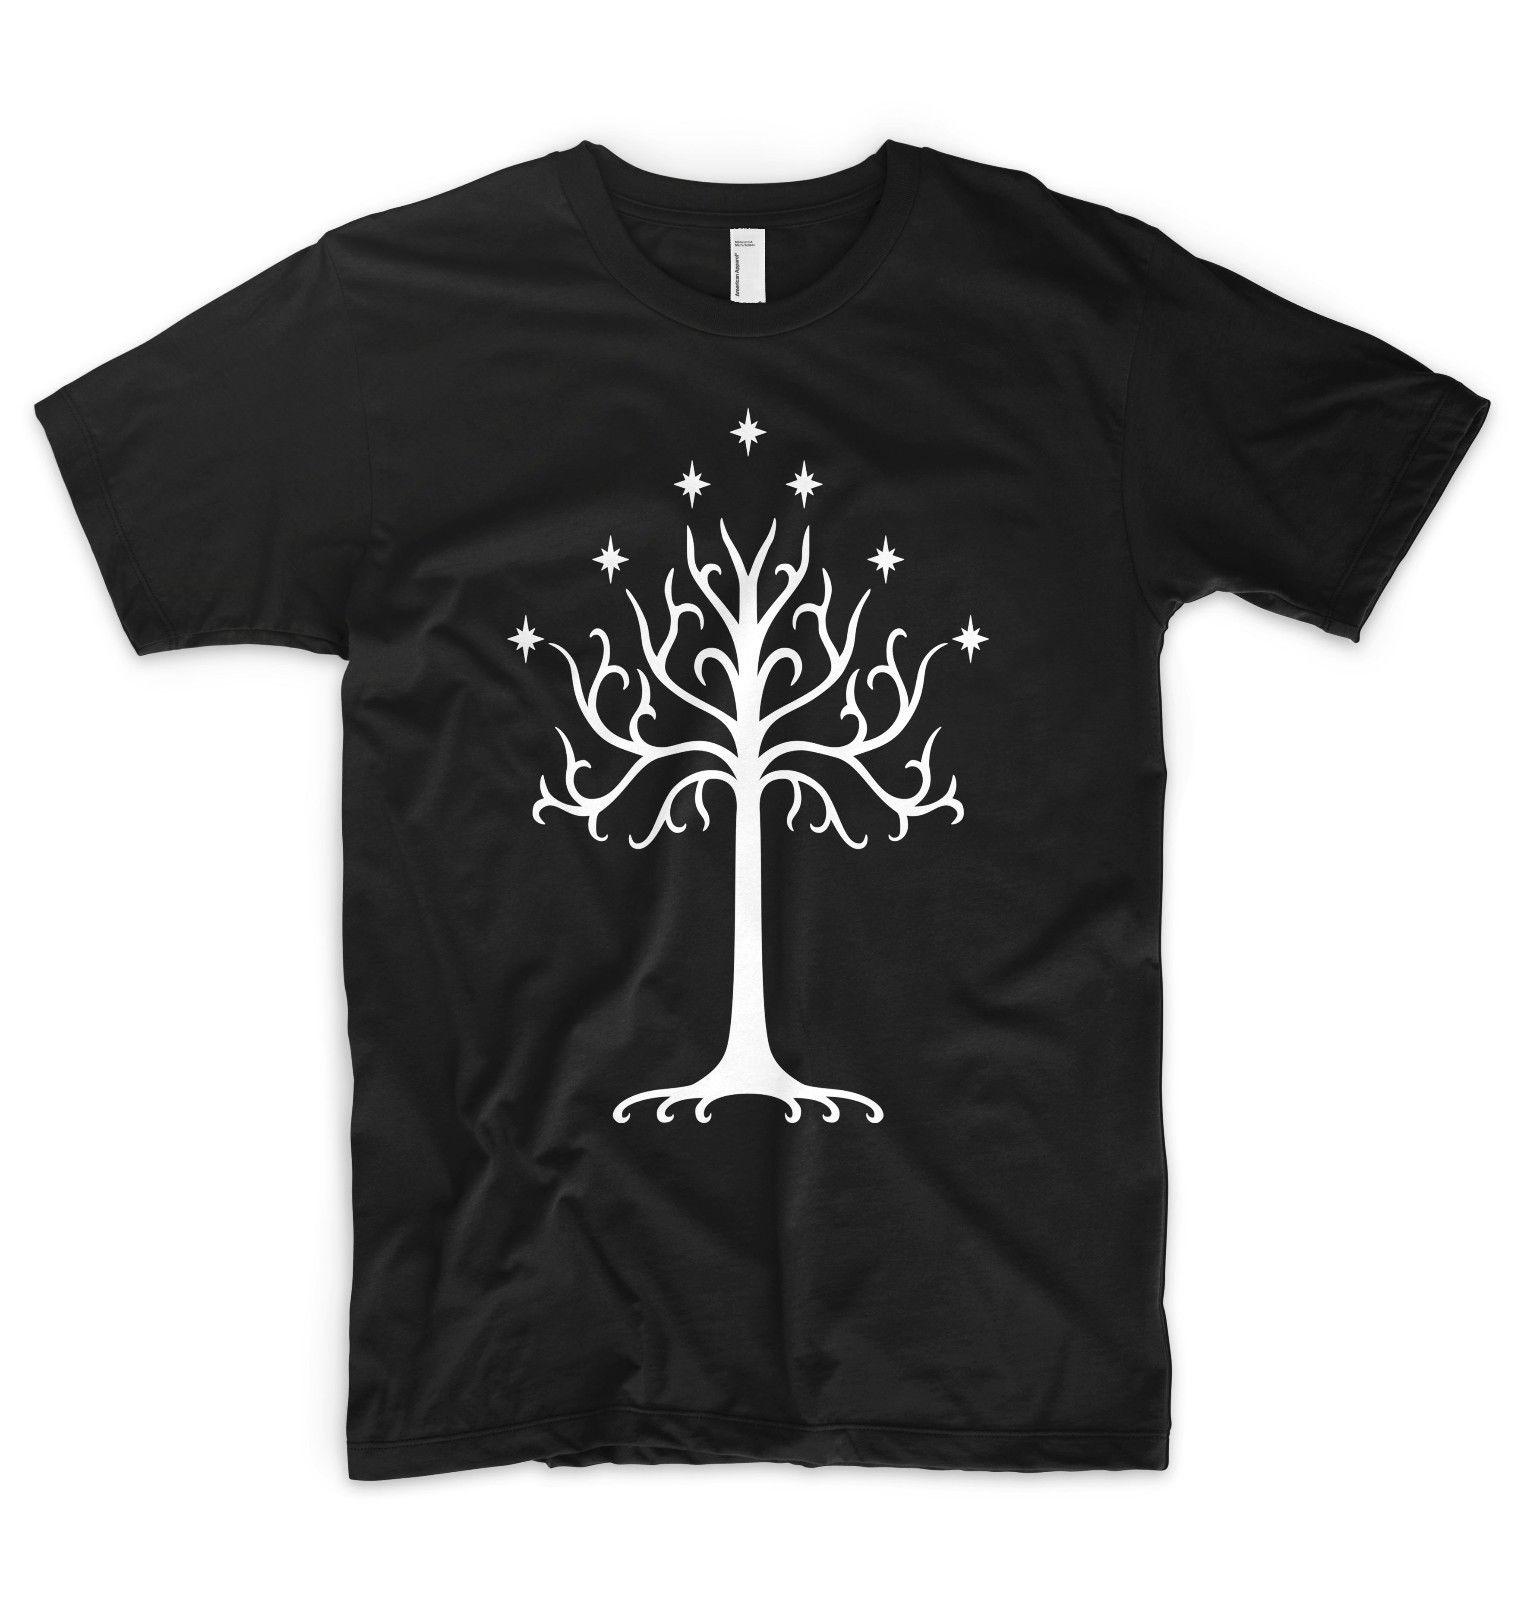 Tree of Gondor T Shirt The Lord of The Rings Hobbit Saruman Gandalf Frodo LOTR White O Neck Cotton T-Shirt Cartoon